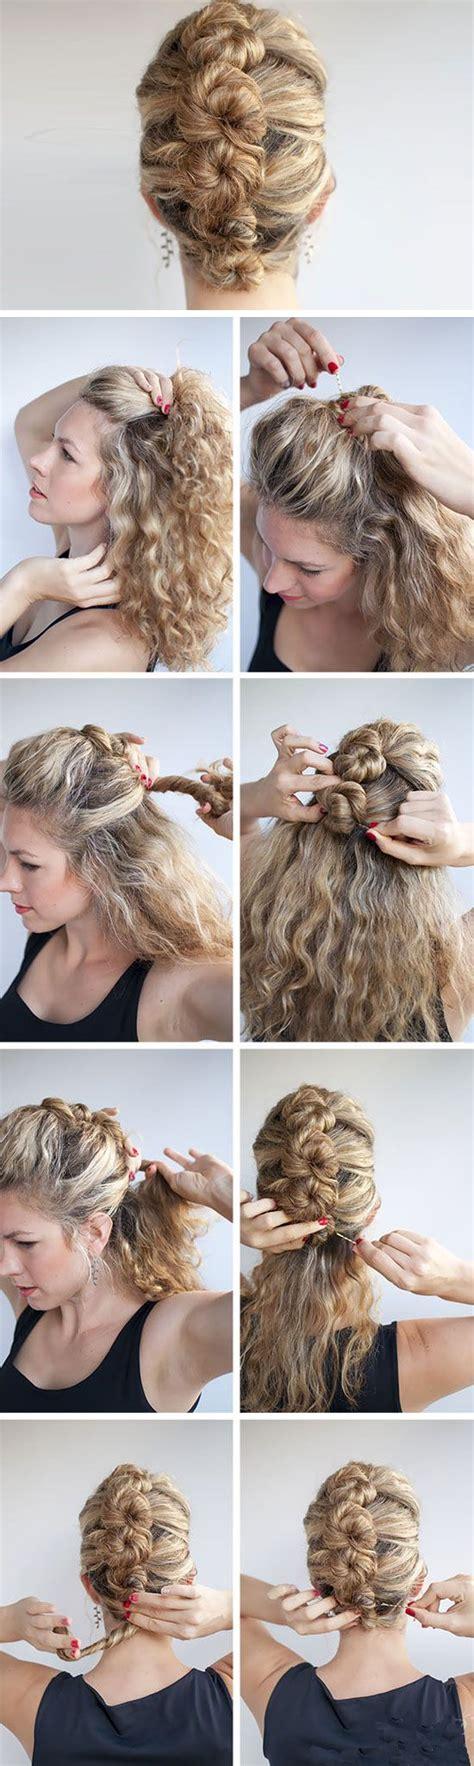 easy twist styles for hair glavportal 8131